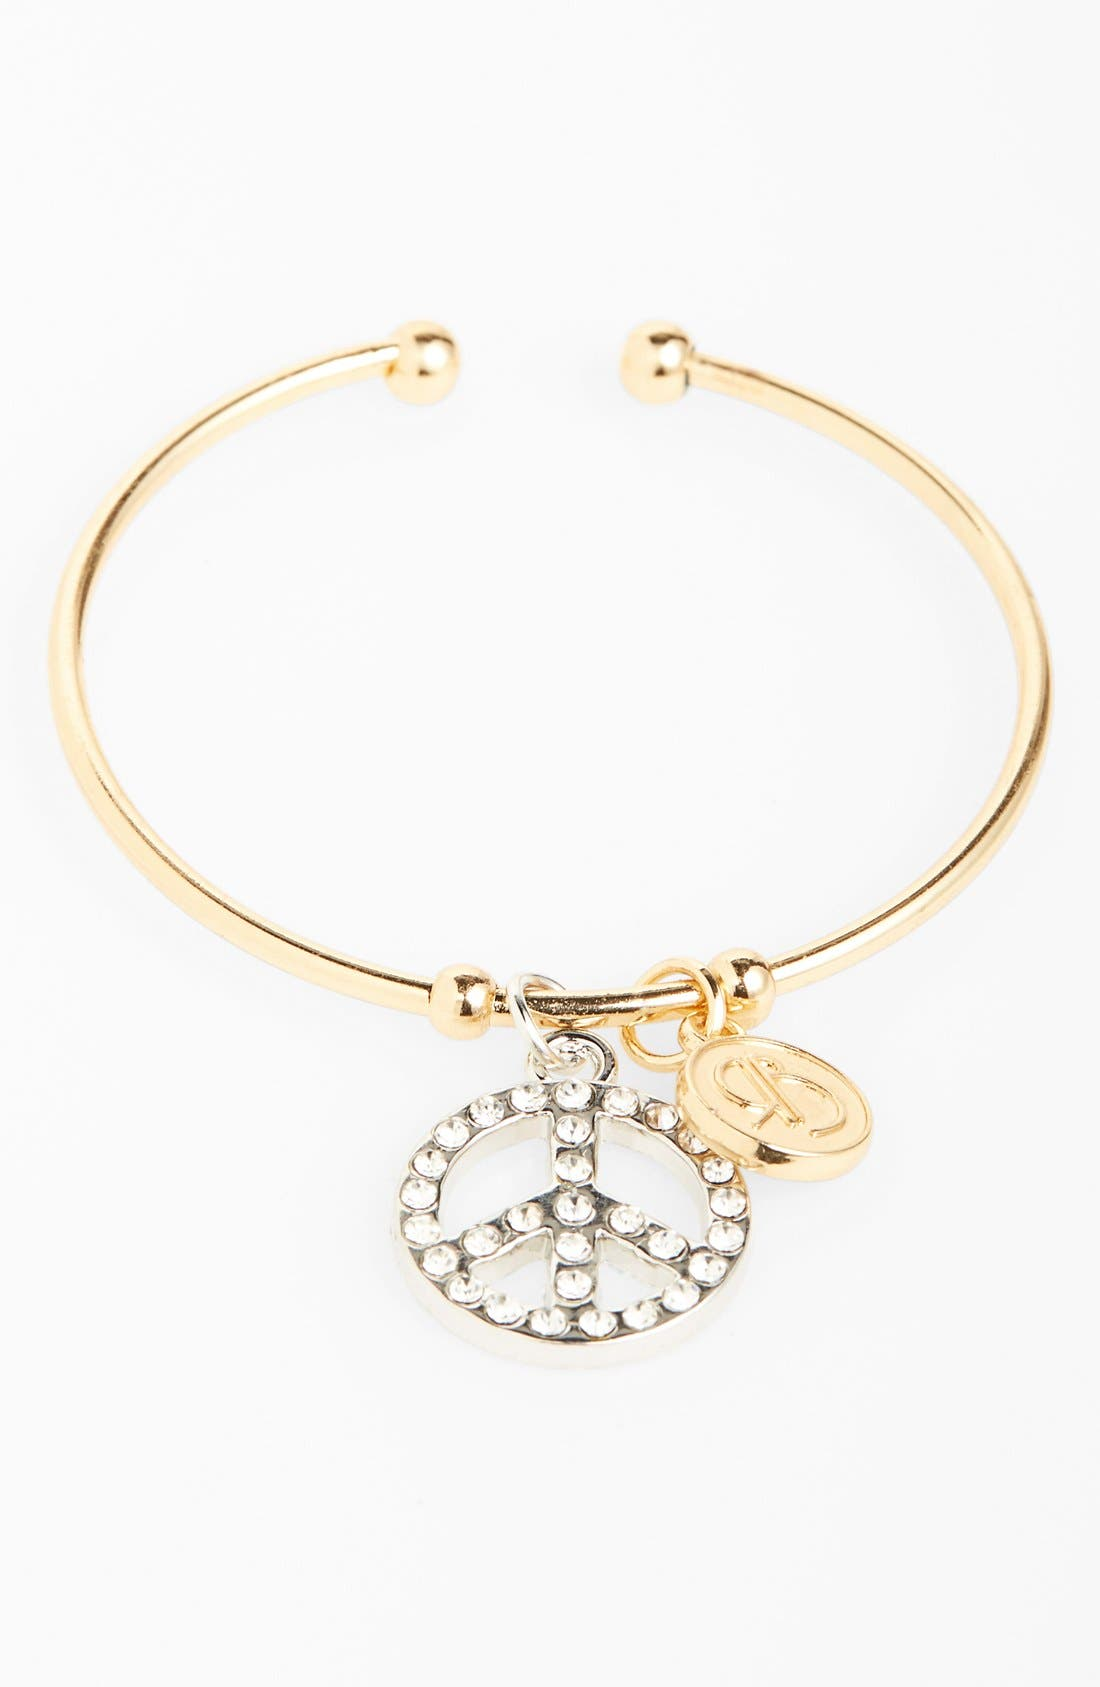 Main Image - Rolf Bleu 'Madison - Peace' Bracelet